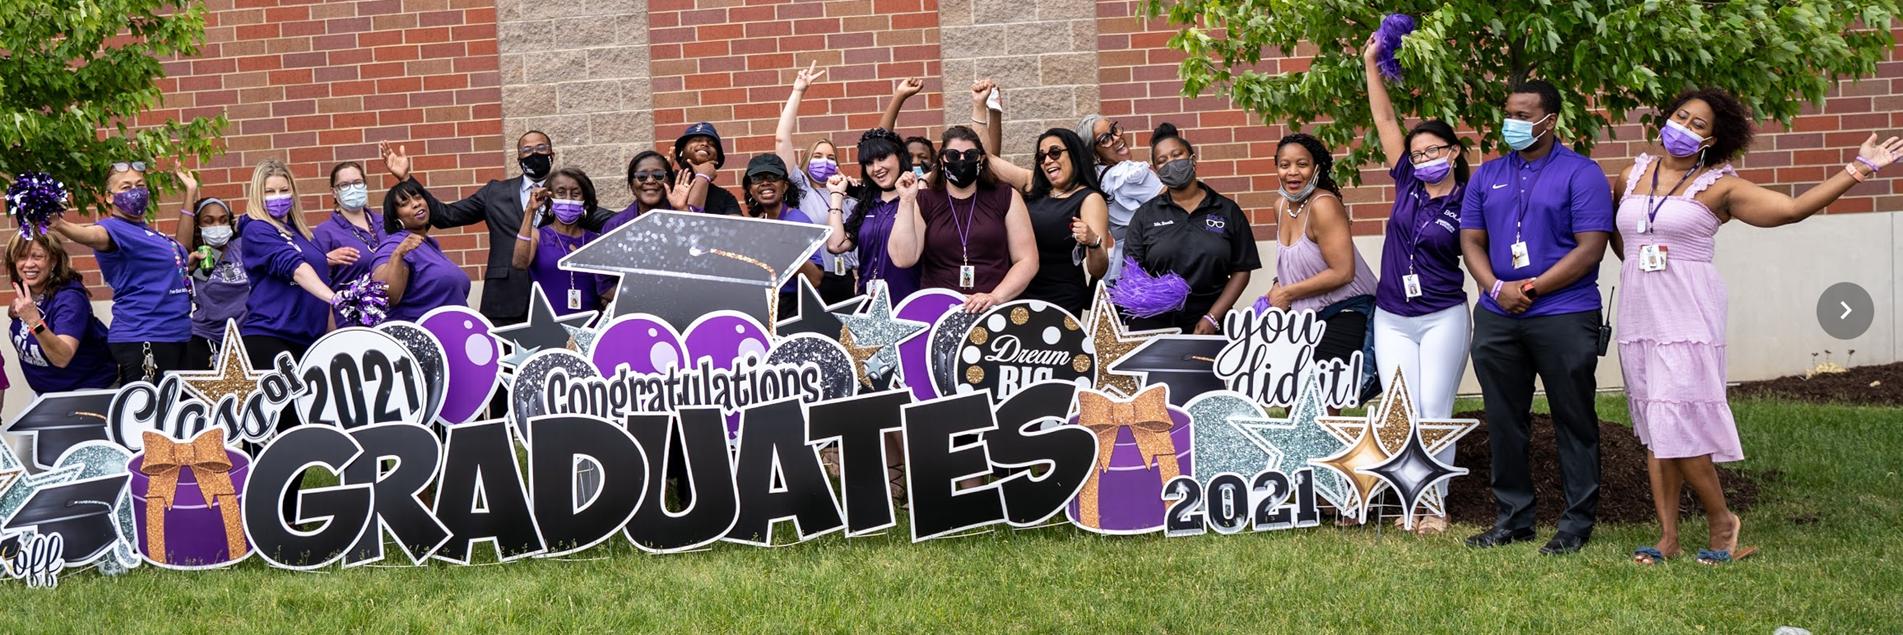 Teachers & staff celebrate 2021 graduates